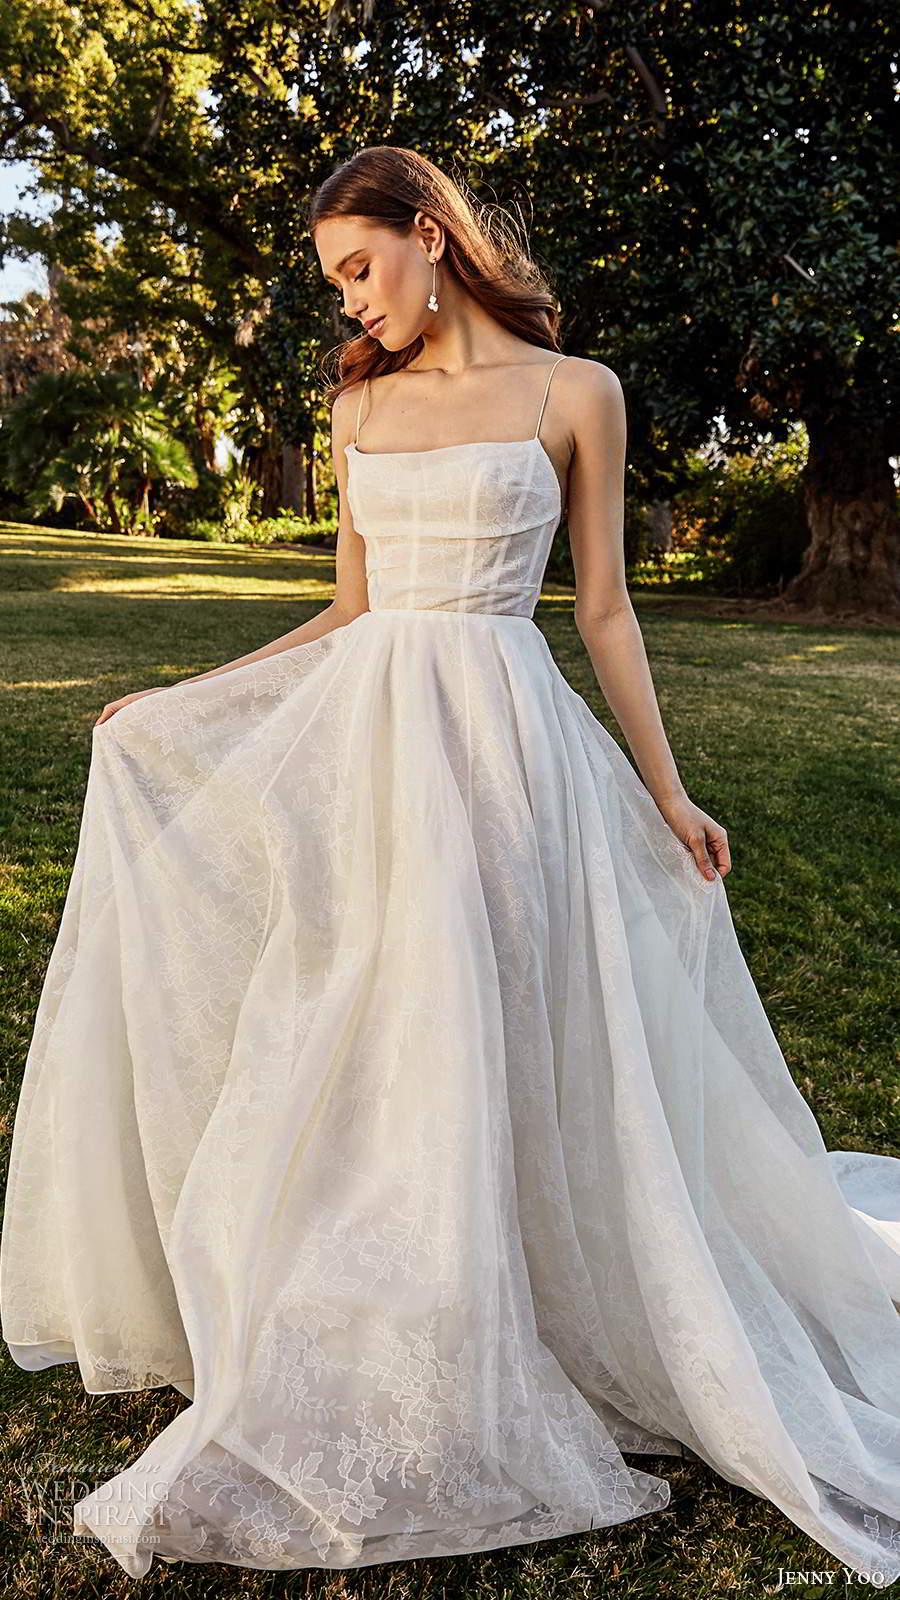 jenny yoo spring 2020 bridal sleeveless thin straps cowl straight neckline a line ball gown wedding dress pocket chapel train (6) fv